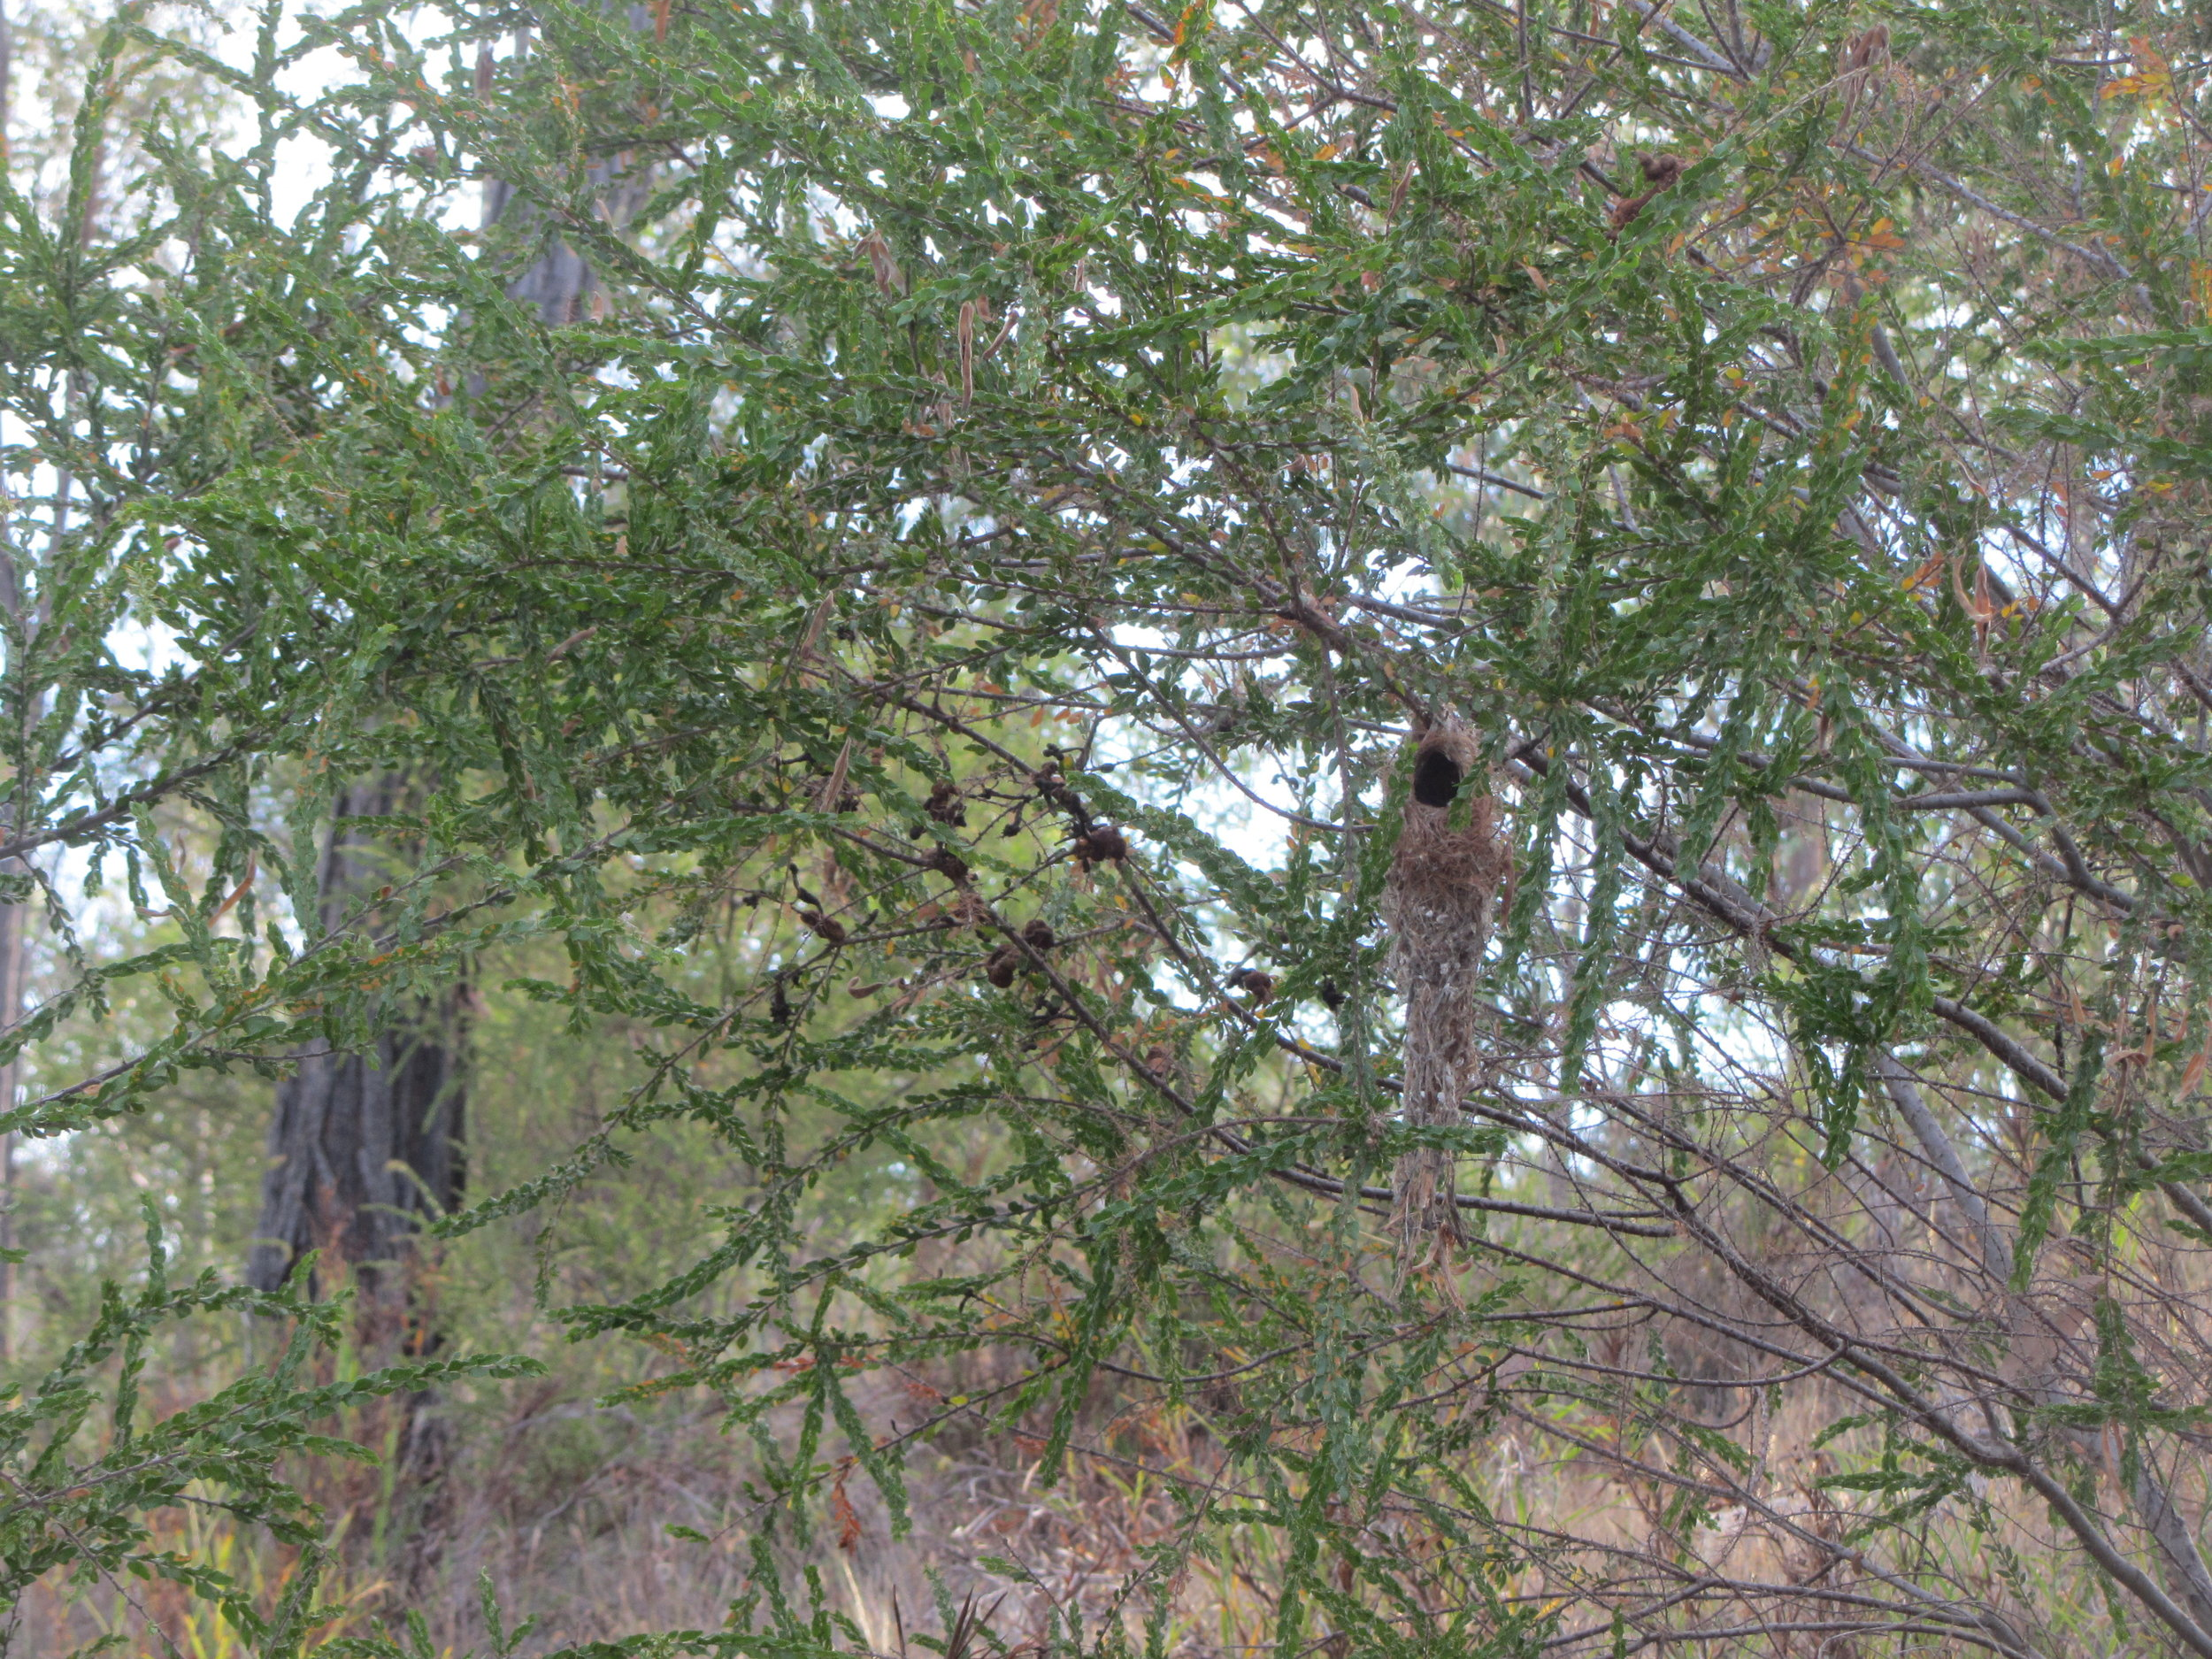 Western Gerygone nest in Acacia paradoxa